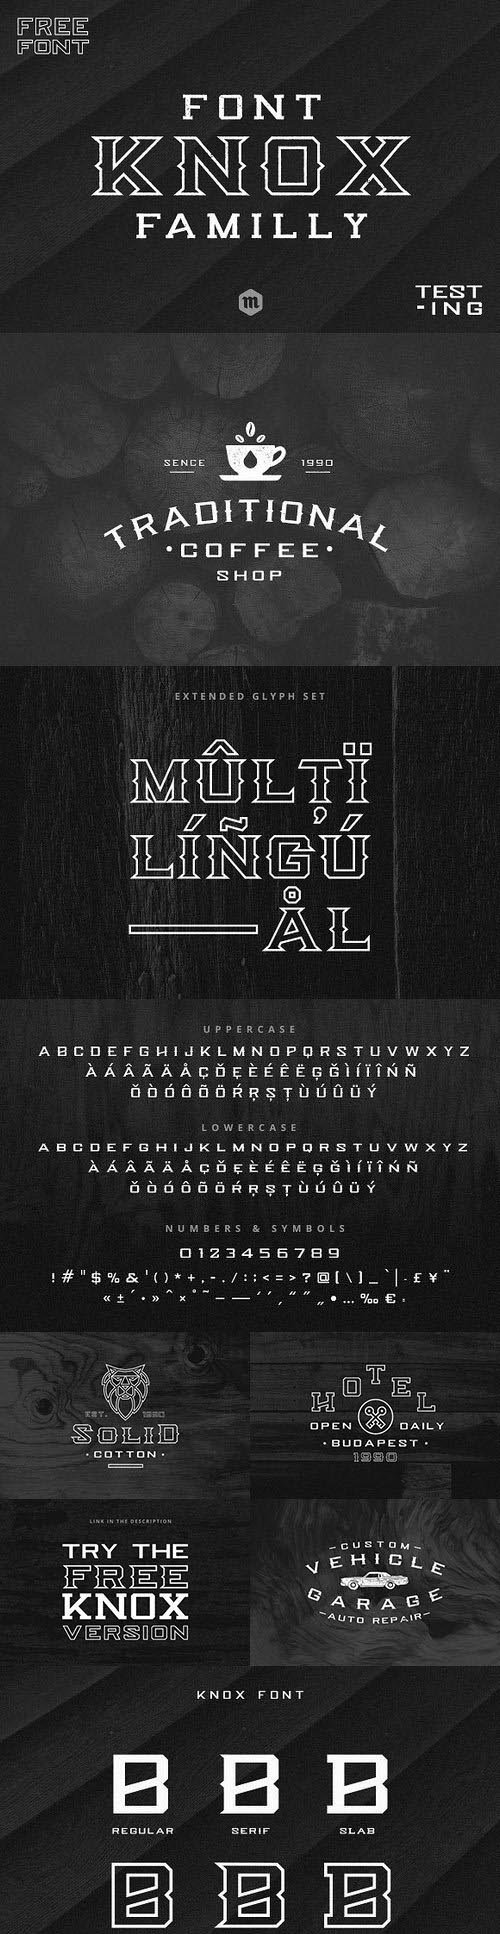 Knox Serif Typeface 1113159